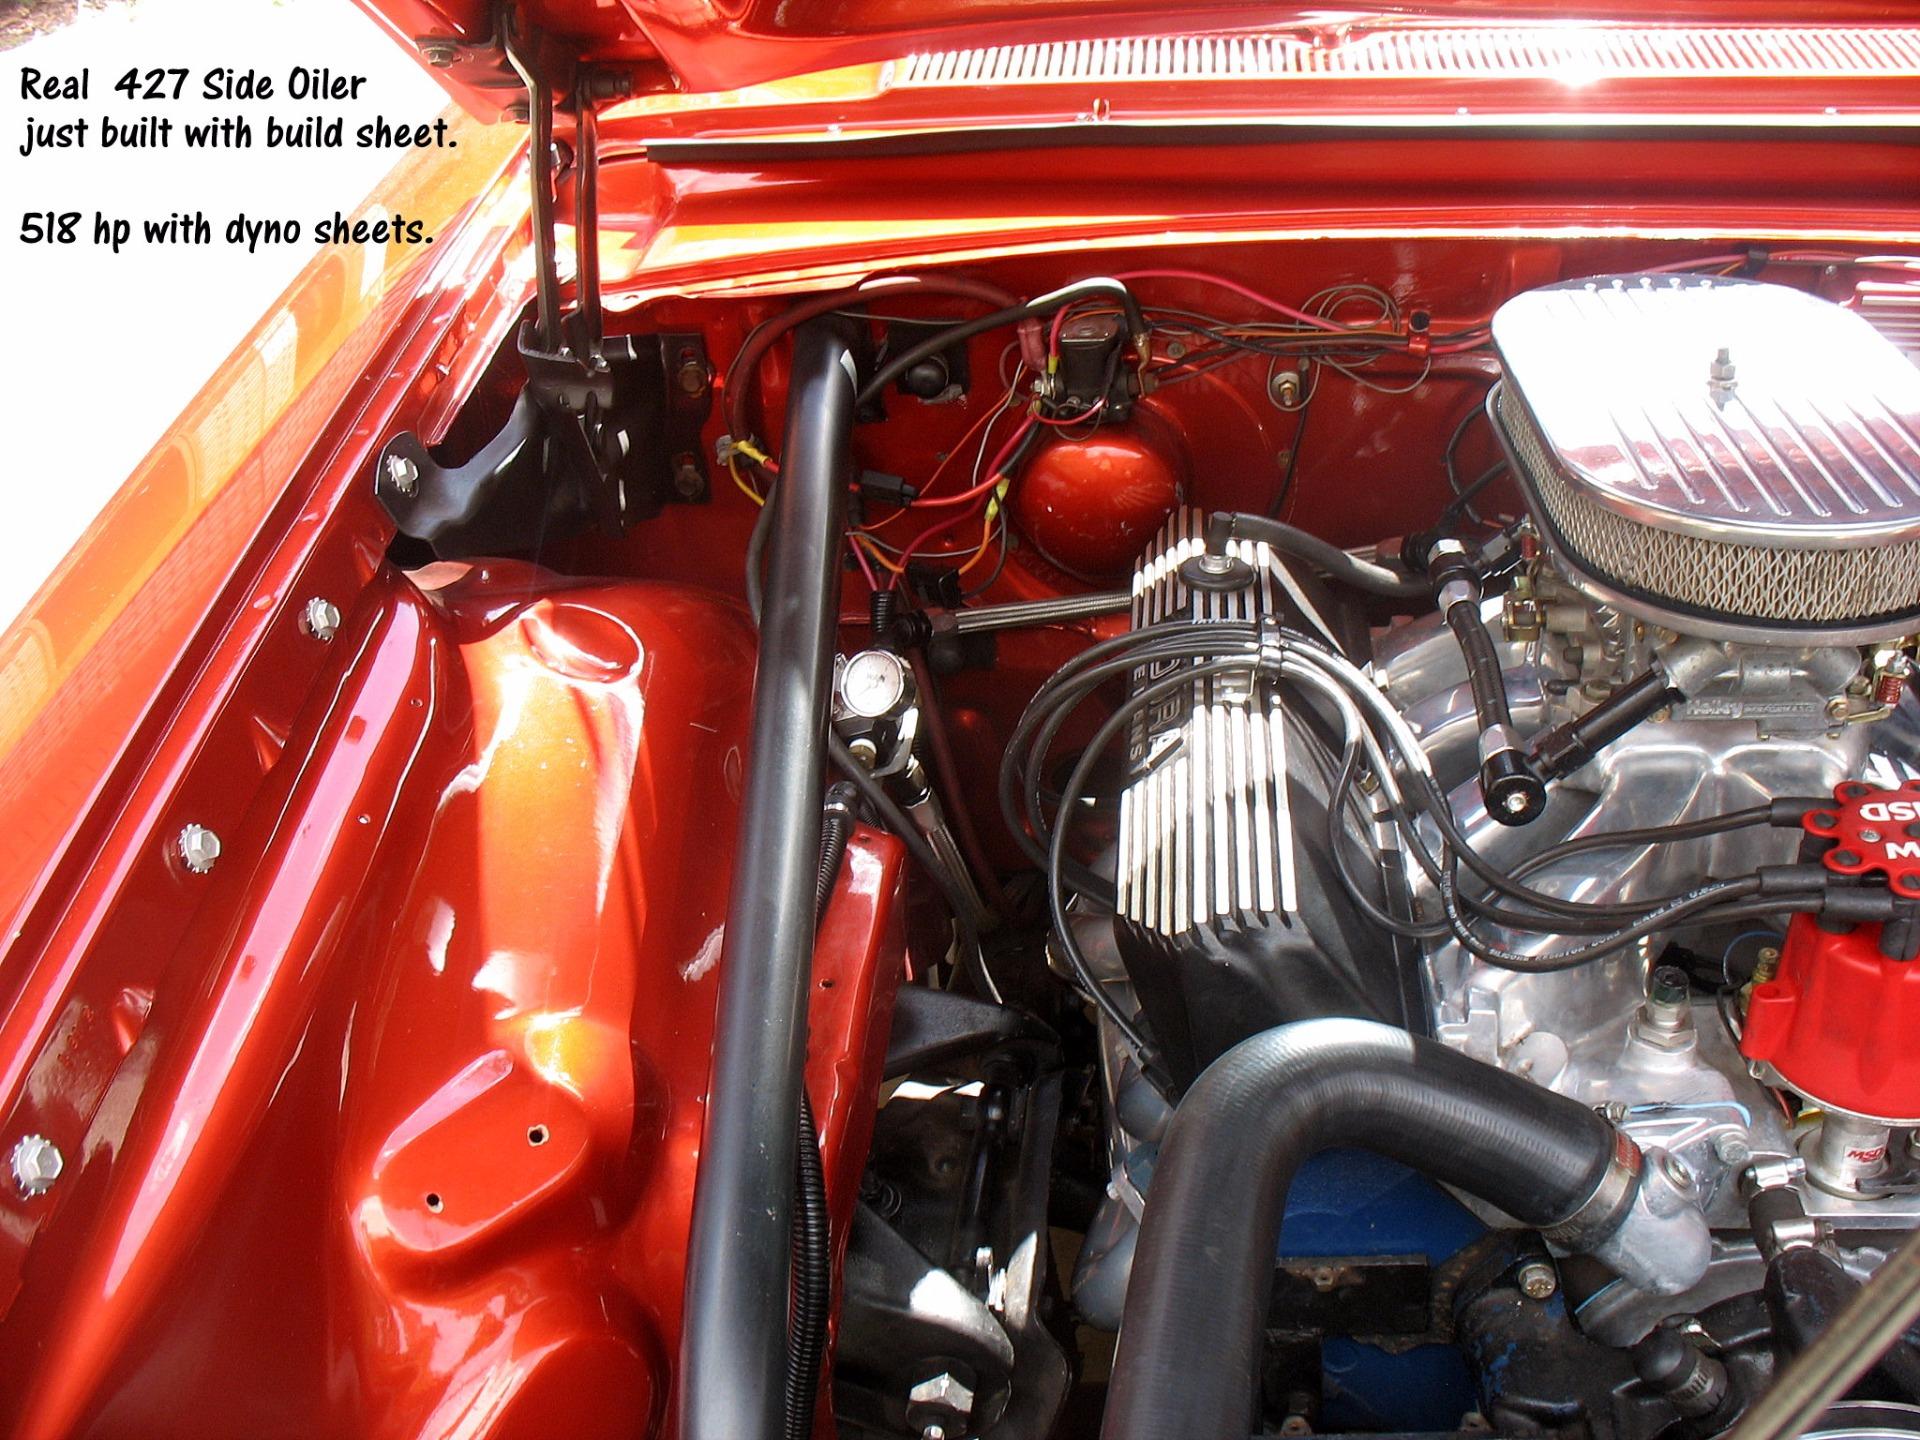 1964 Ford Galaxie XL Lightweight - SOLD!! Thunder Bolt